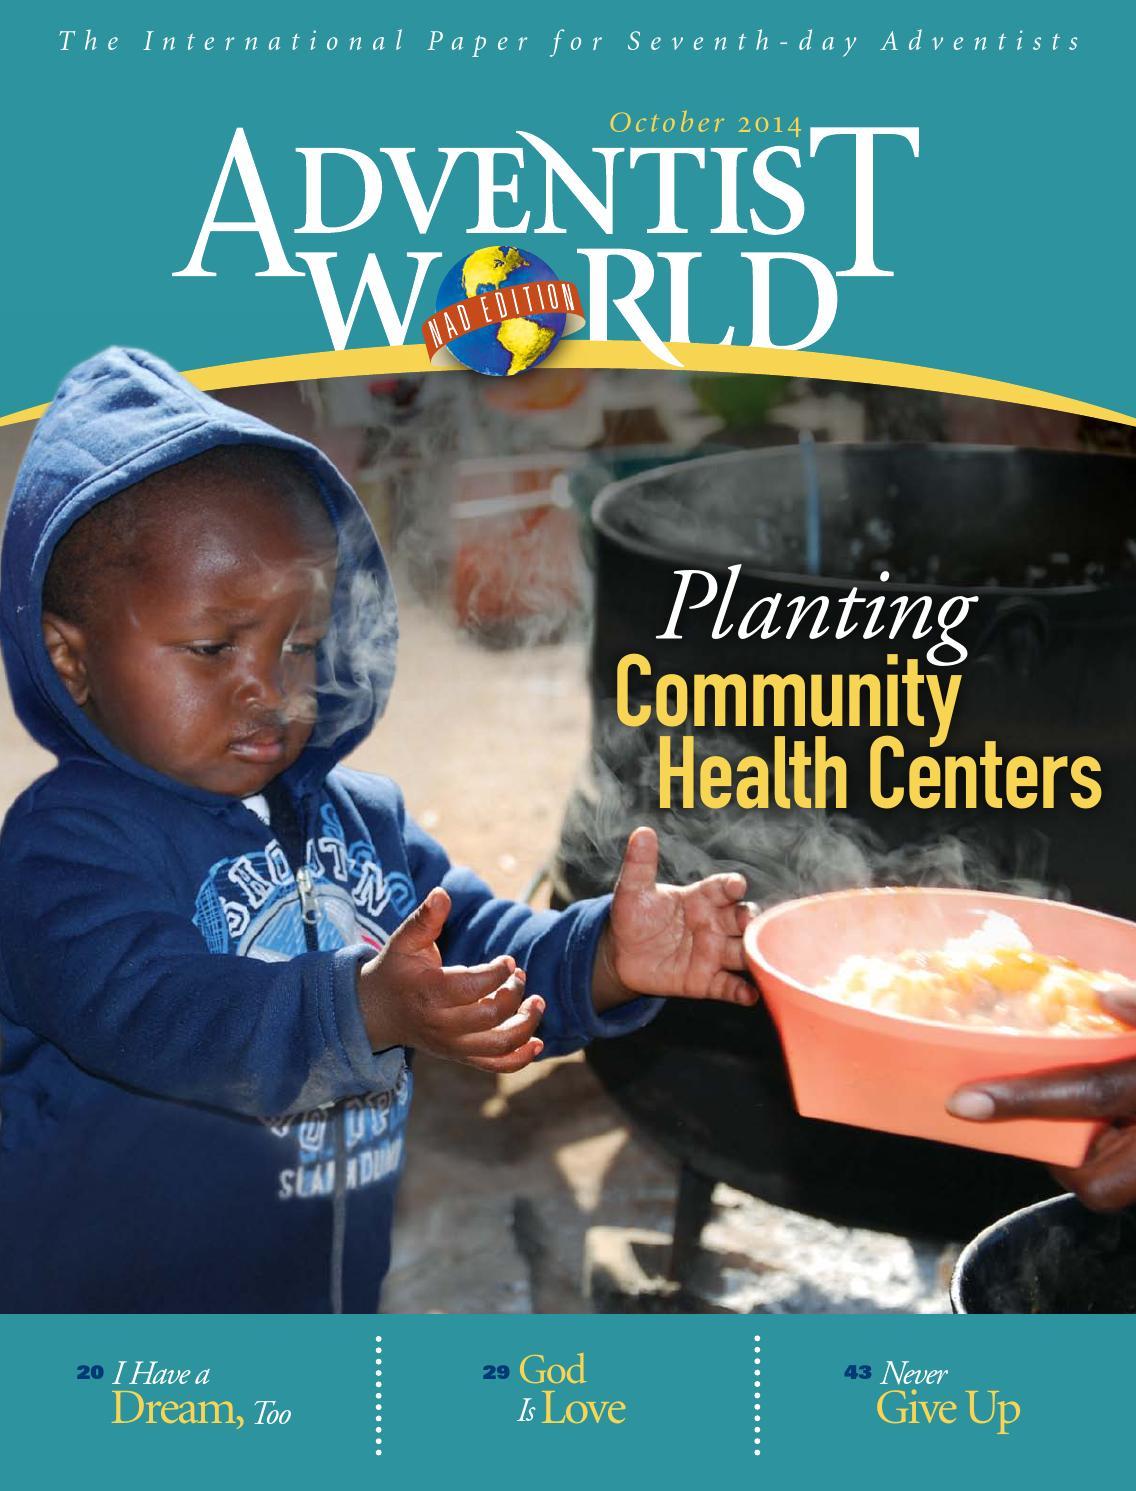 Aw october 2014 nad by Adventist World Magazine - issuu